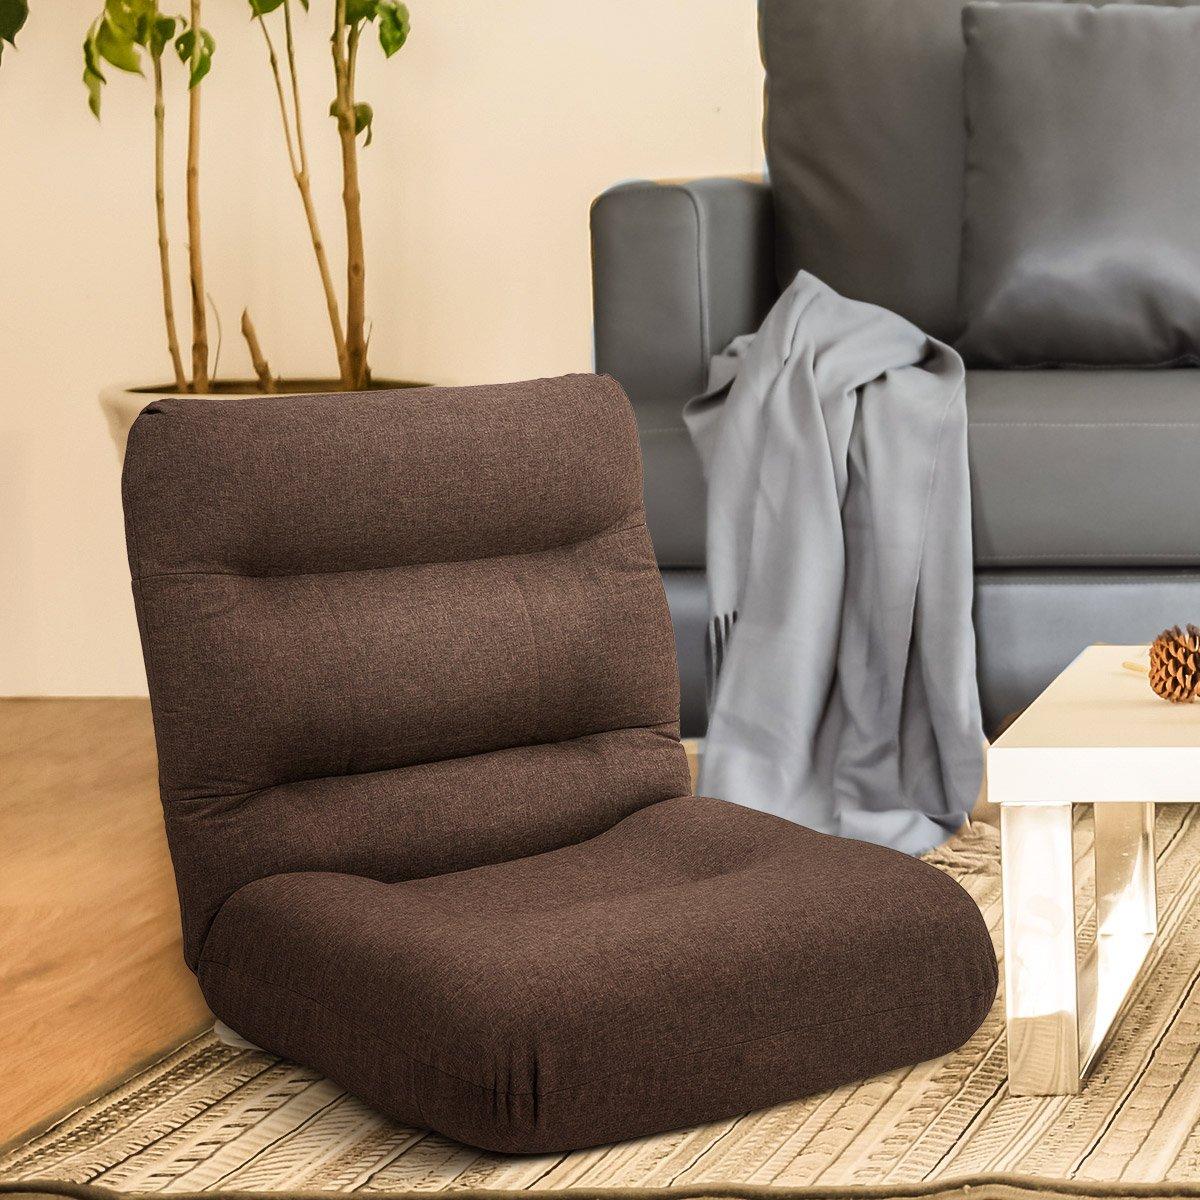 Harper & Bright Designs Adjustable Floor Sofa Gaming Chair Lazy Sofa Folding Chair Cushion (Brown)